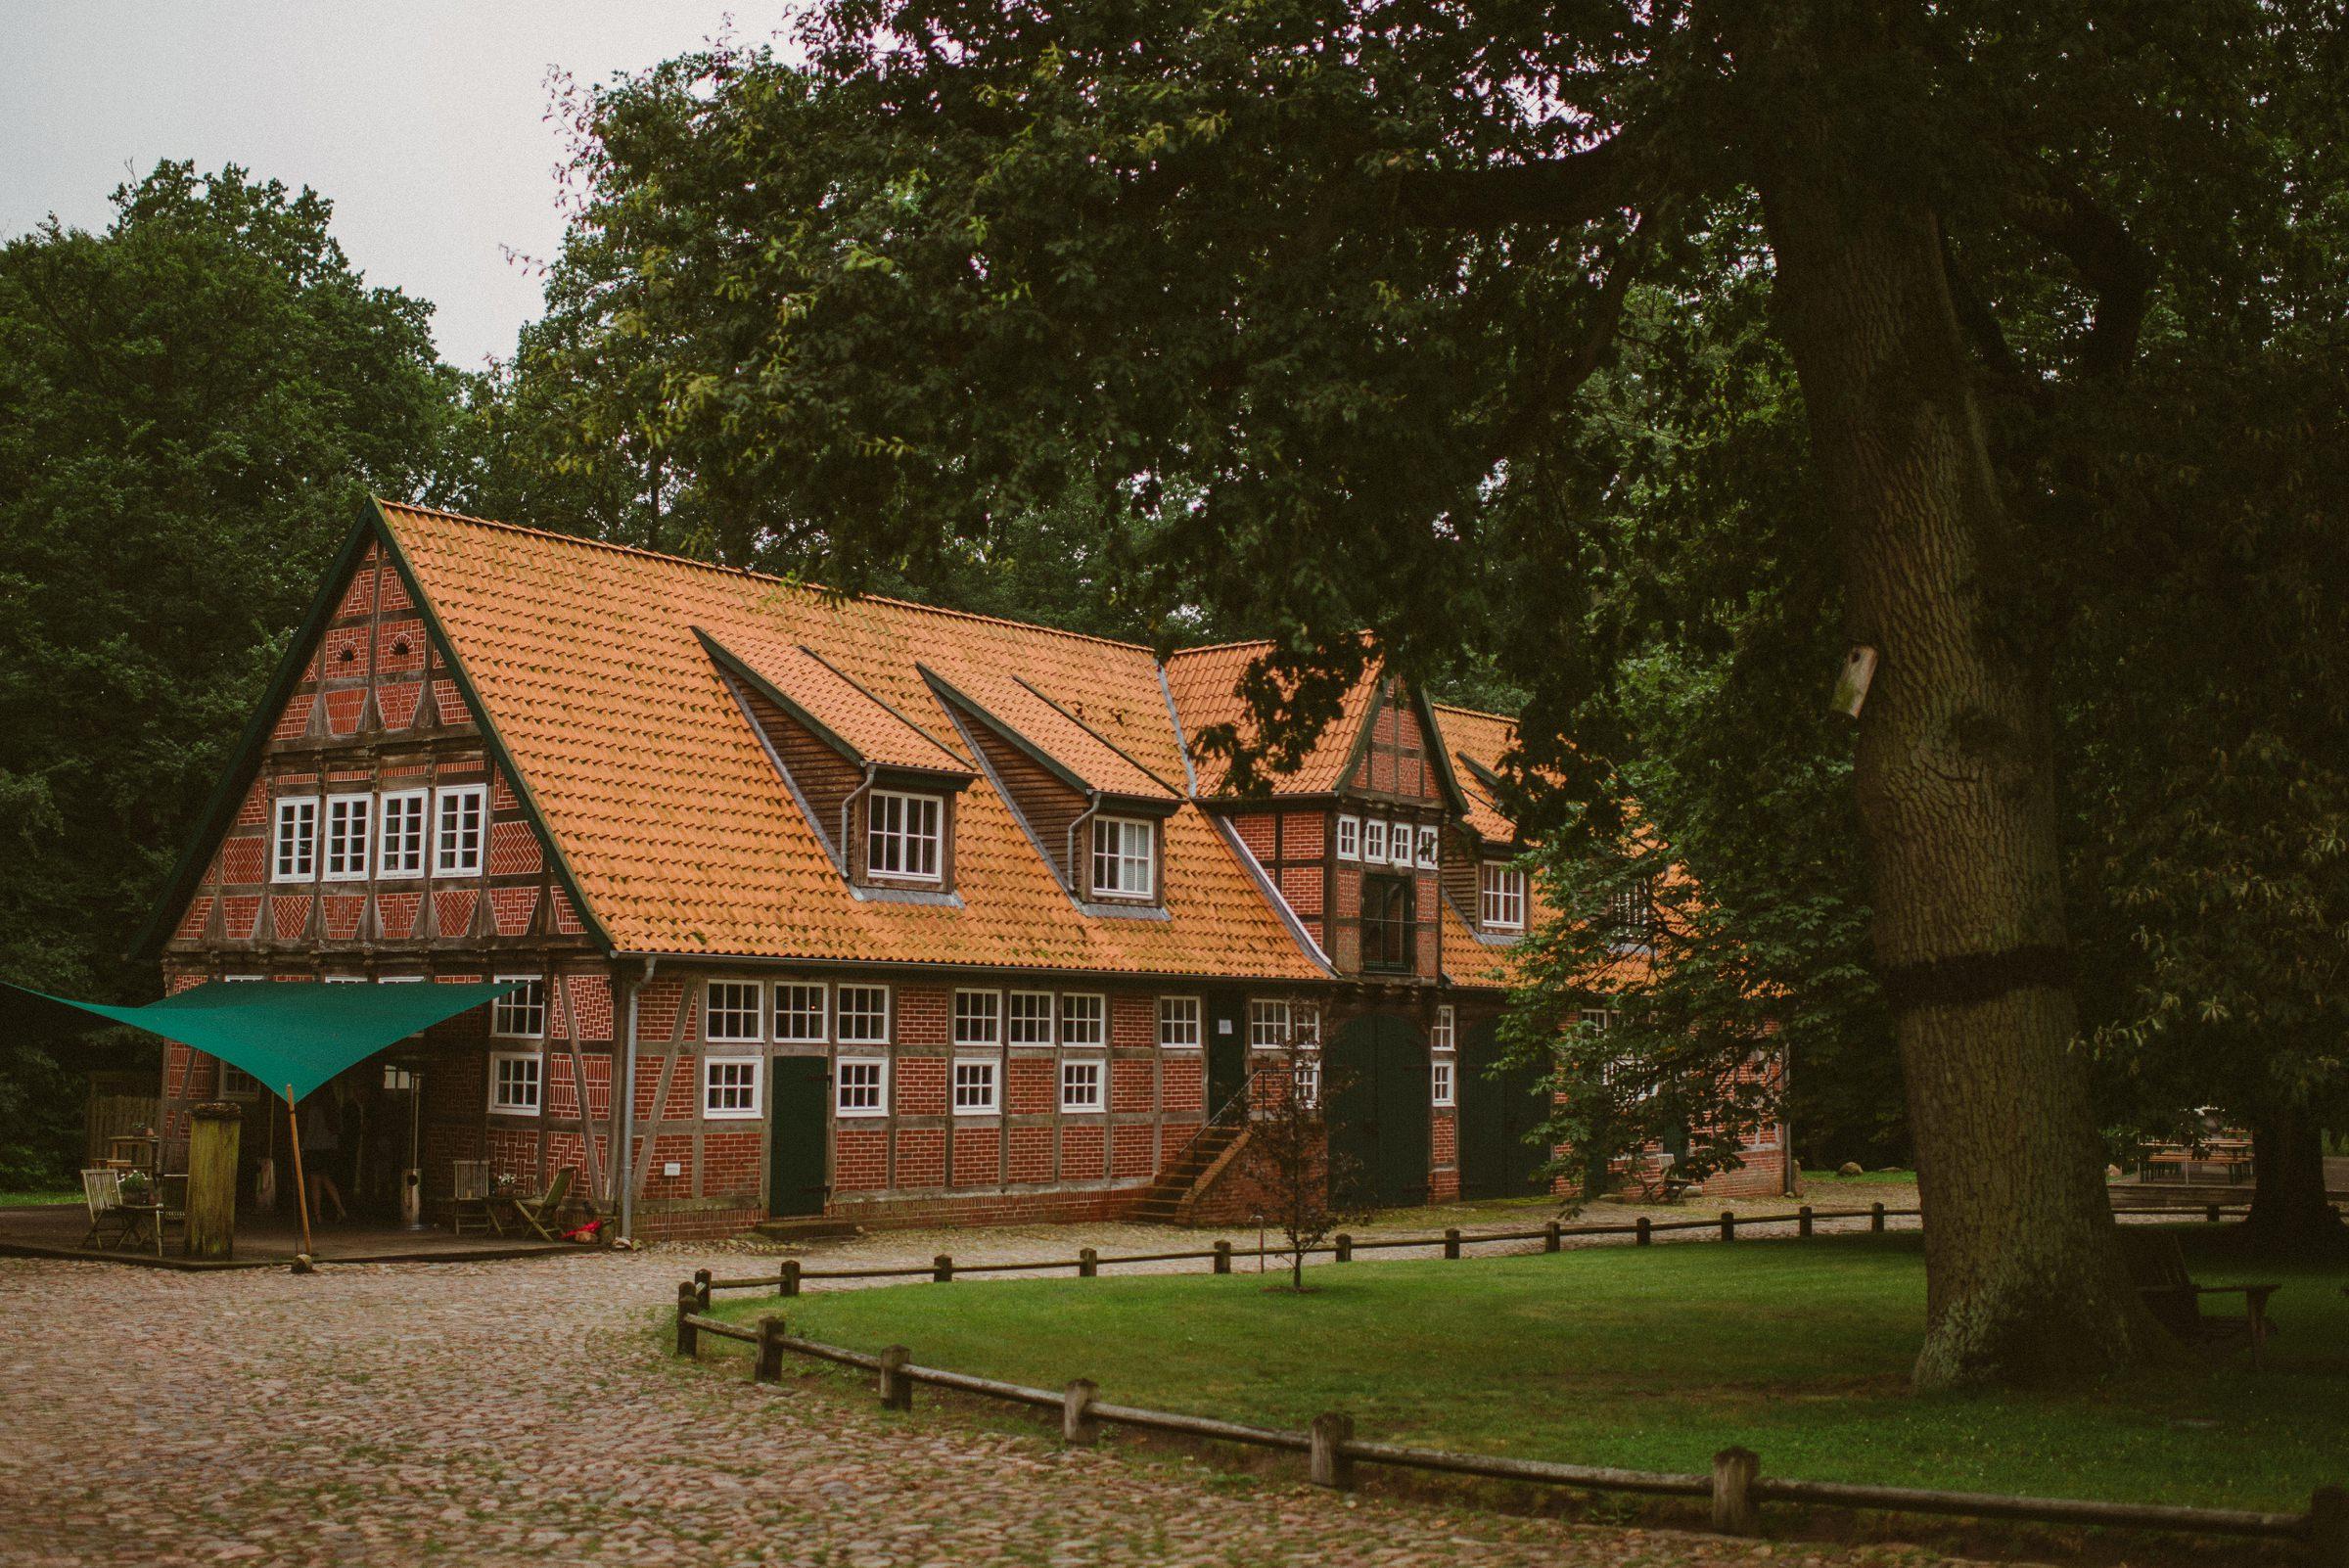 Gutshof, Soderstorf, Heide, Lüneburg, Hannover, Gut Thansen